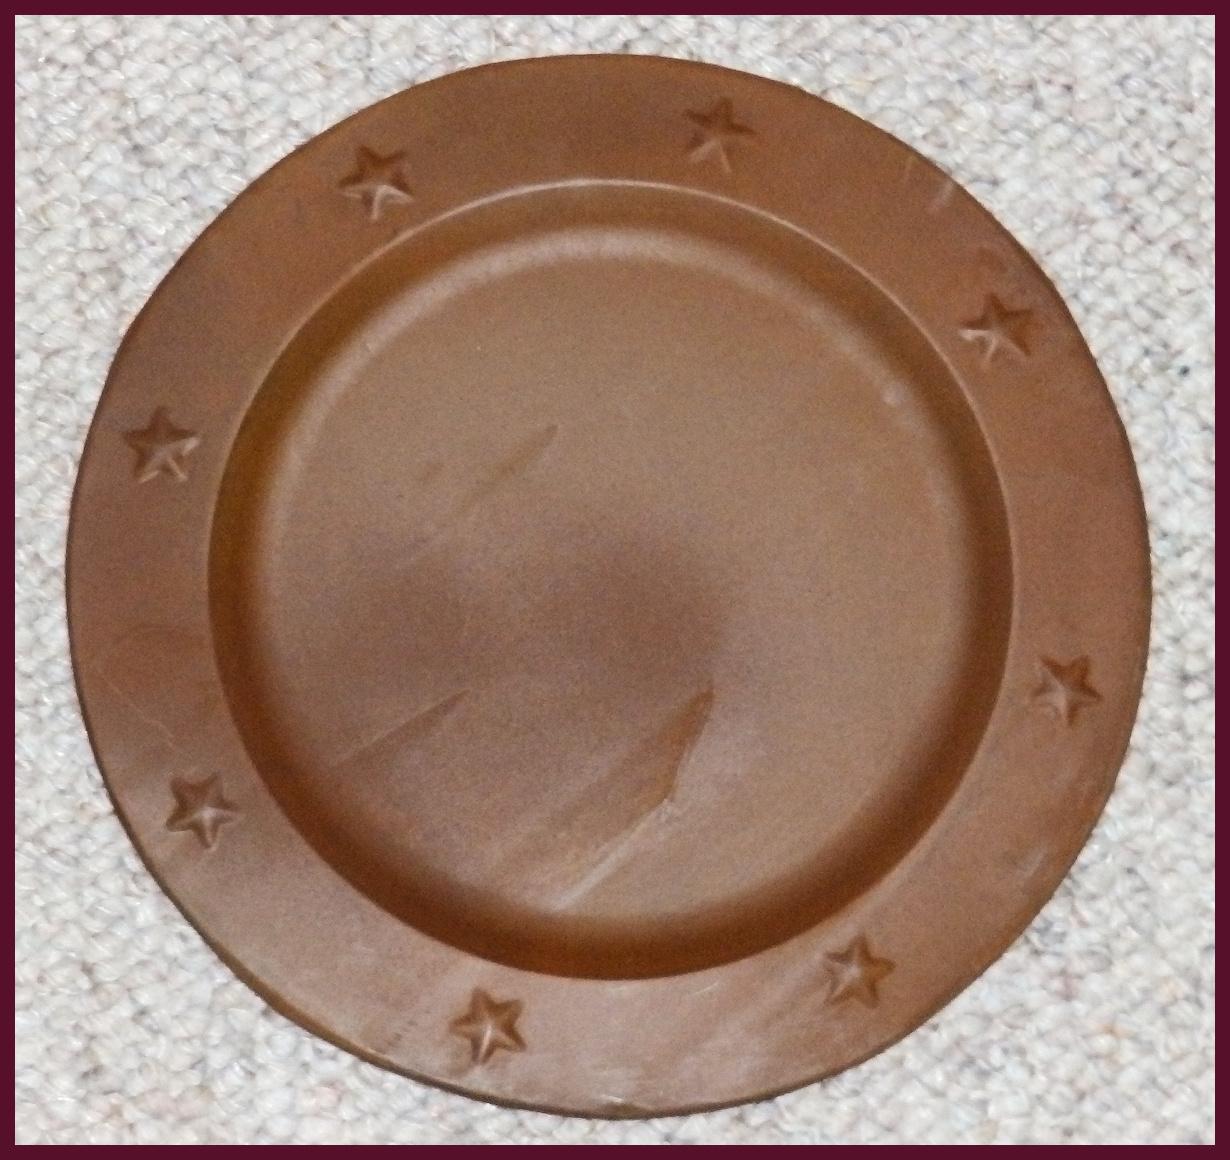 plate-rusty-metal-star-plate-12-inch-t0562.jpg